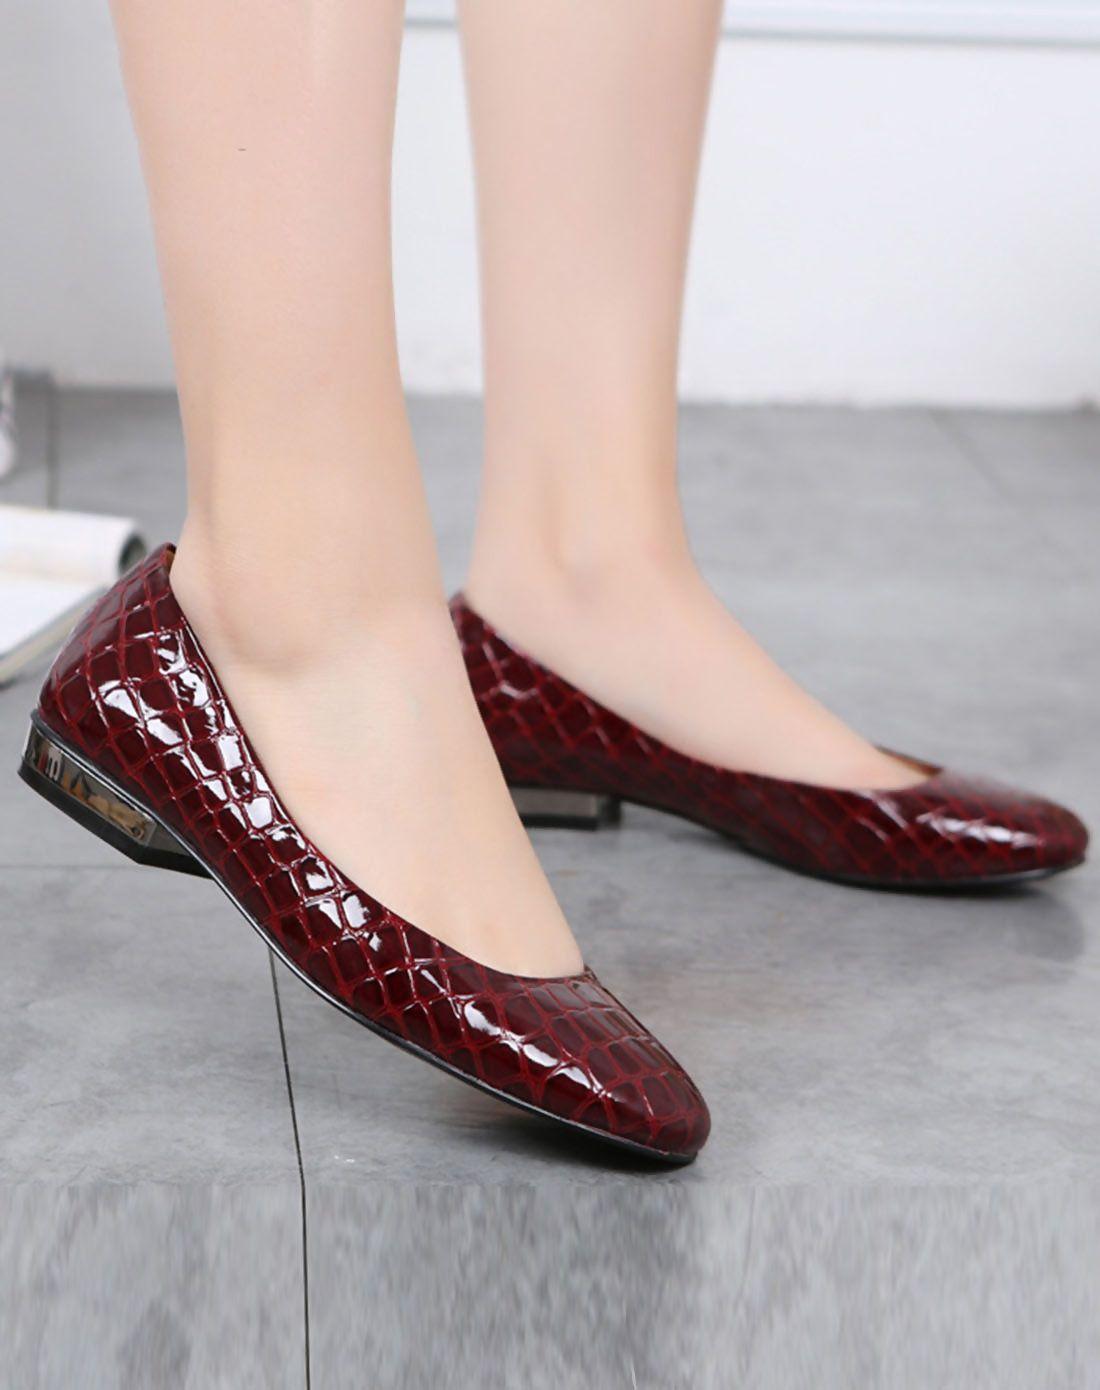 #AdoreWe #VIPme Flats - FOBISON Red Serpentine Round Toe Slip-on Flats - AdoreWe.com